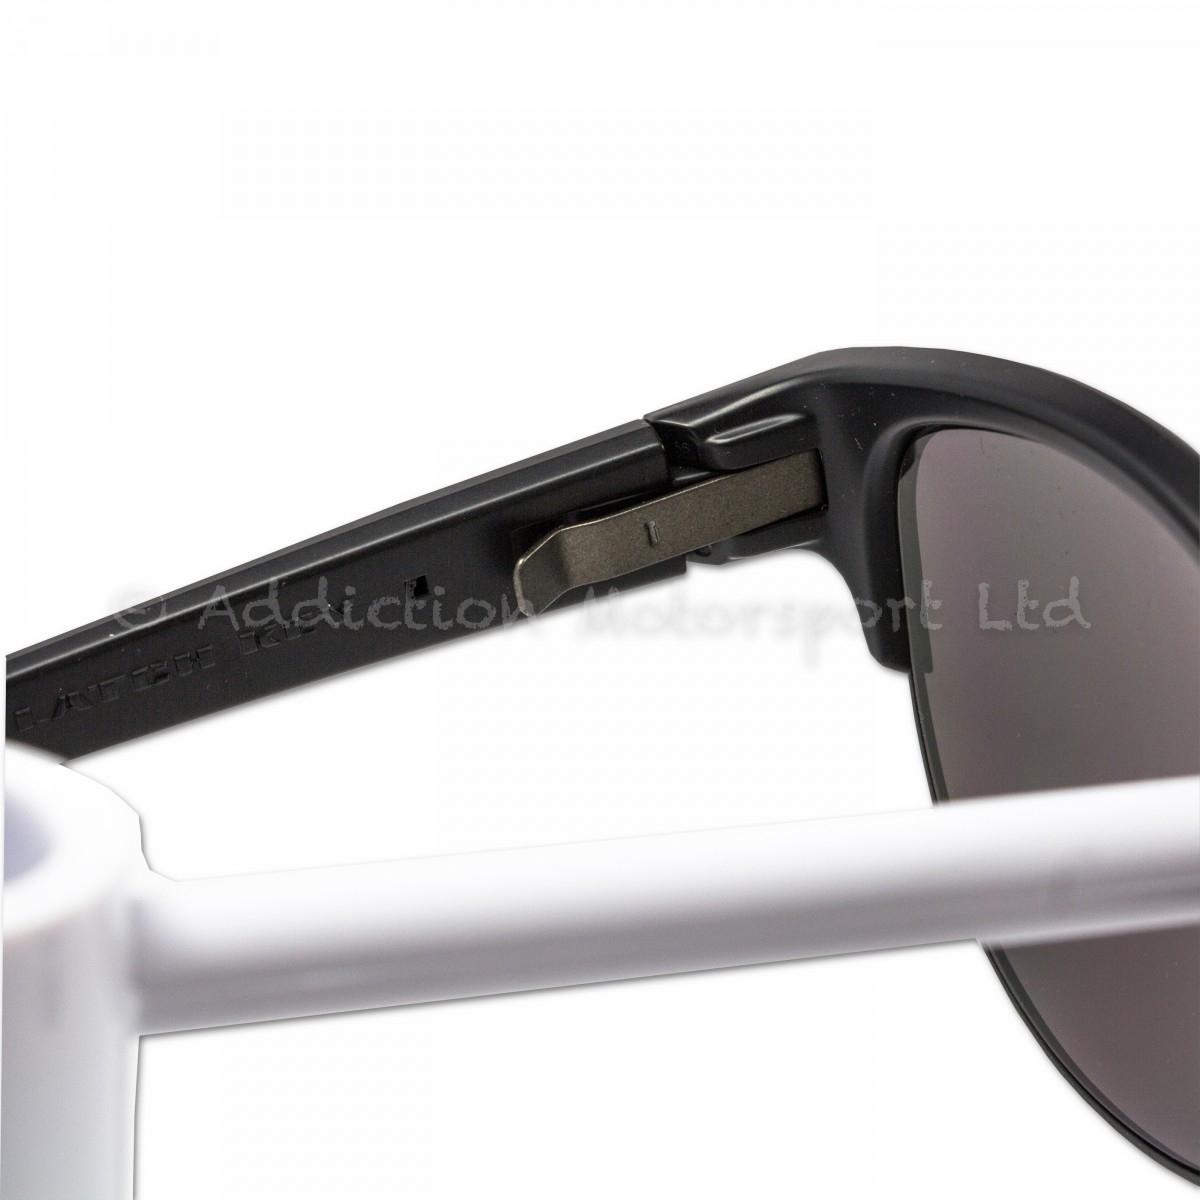 c13c592174c OAKLEY Latch Key Marc Marquez MM93 Sunglasses - Addiction Motorsport Ltd